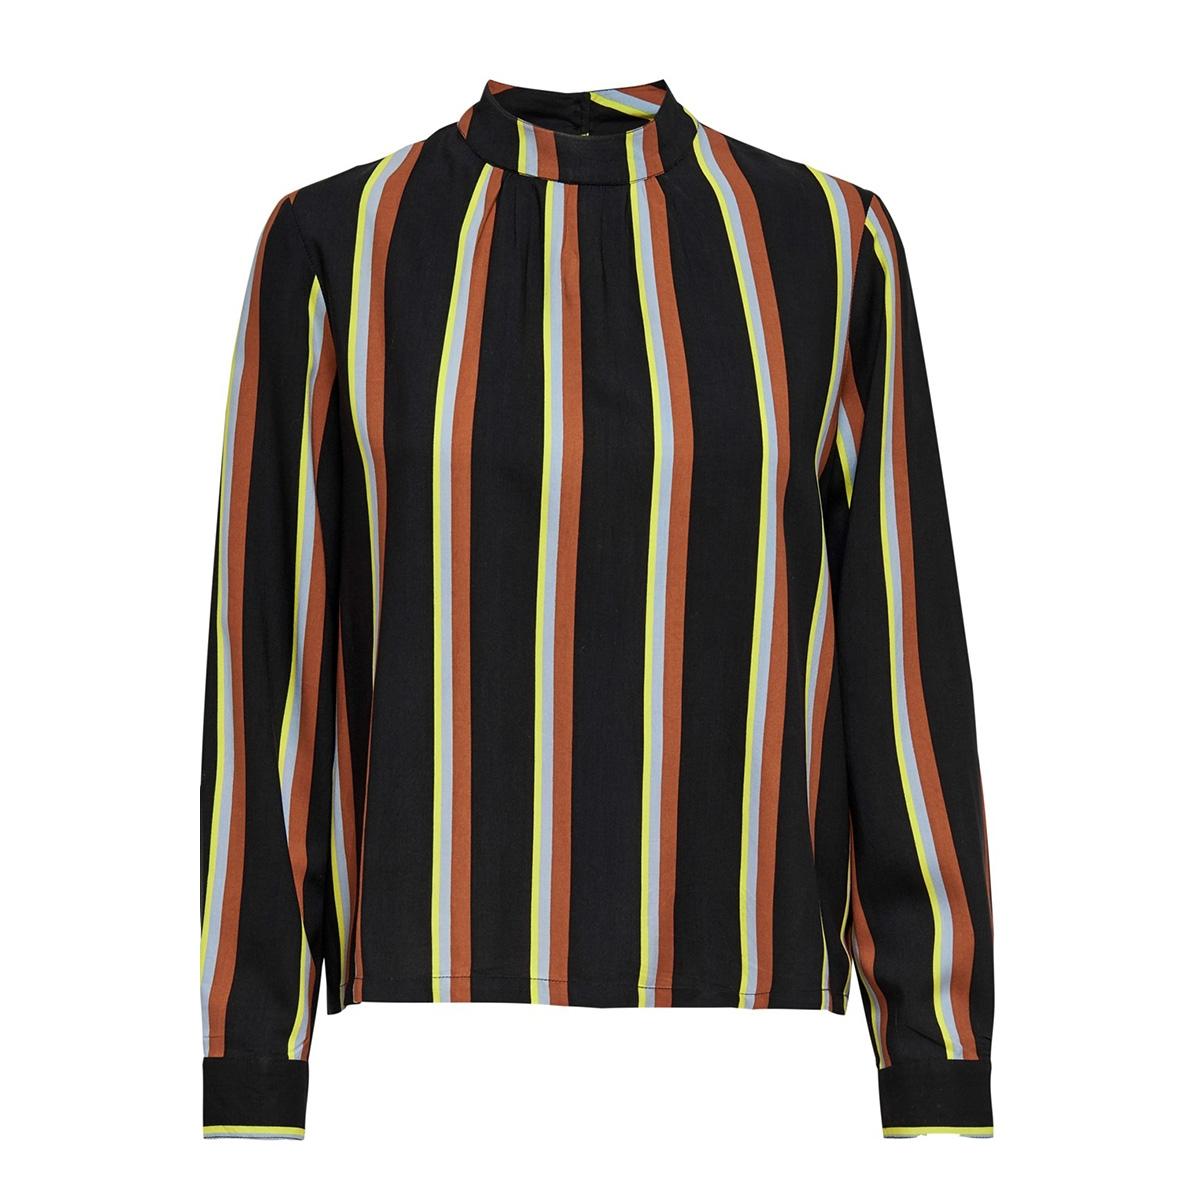 onlmai l/s highneck top wvn 15201731 only t-shirt black